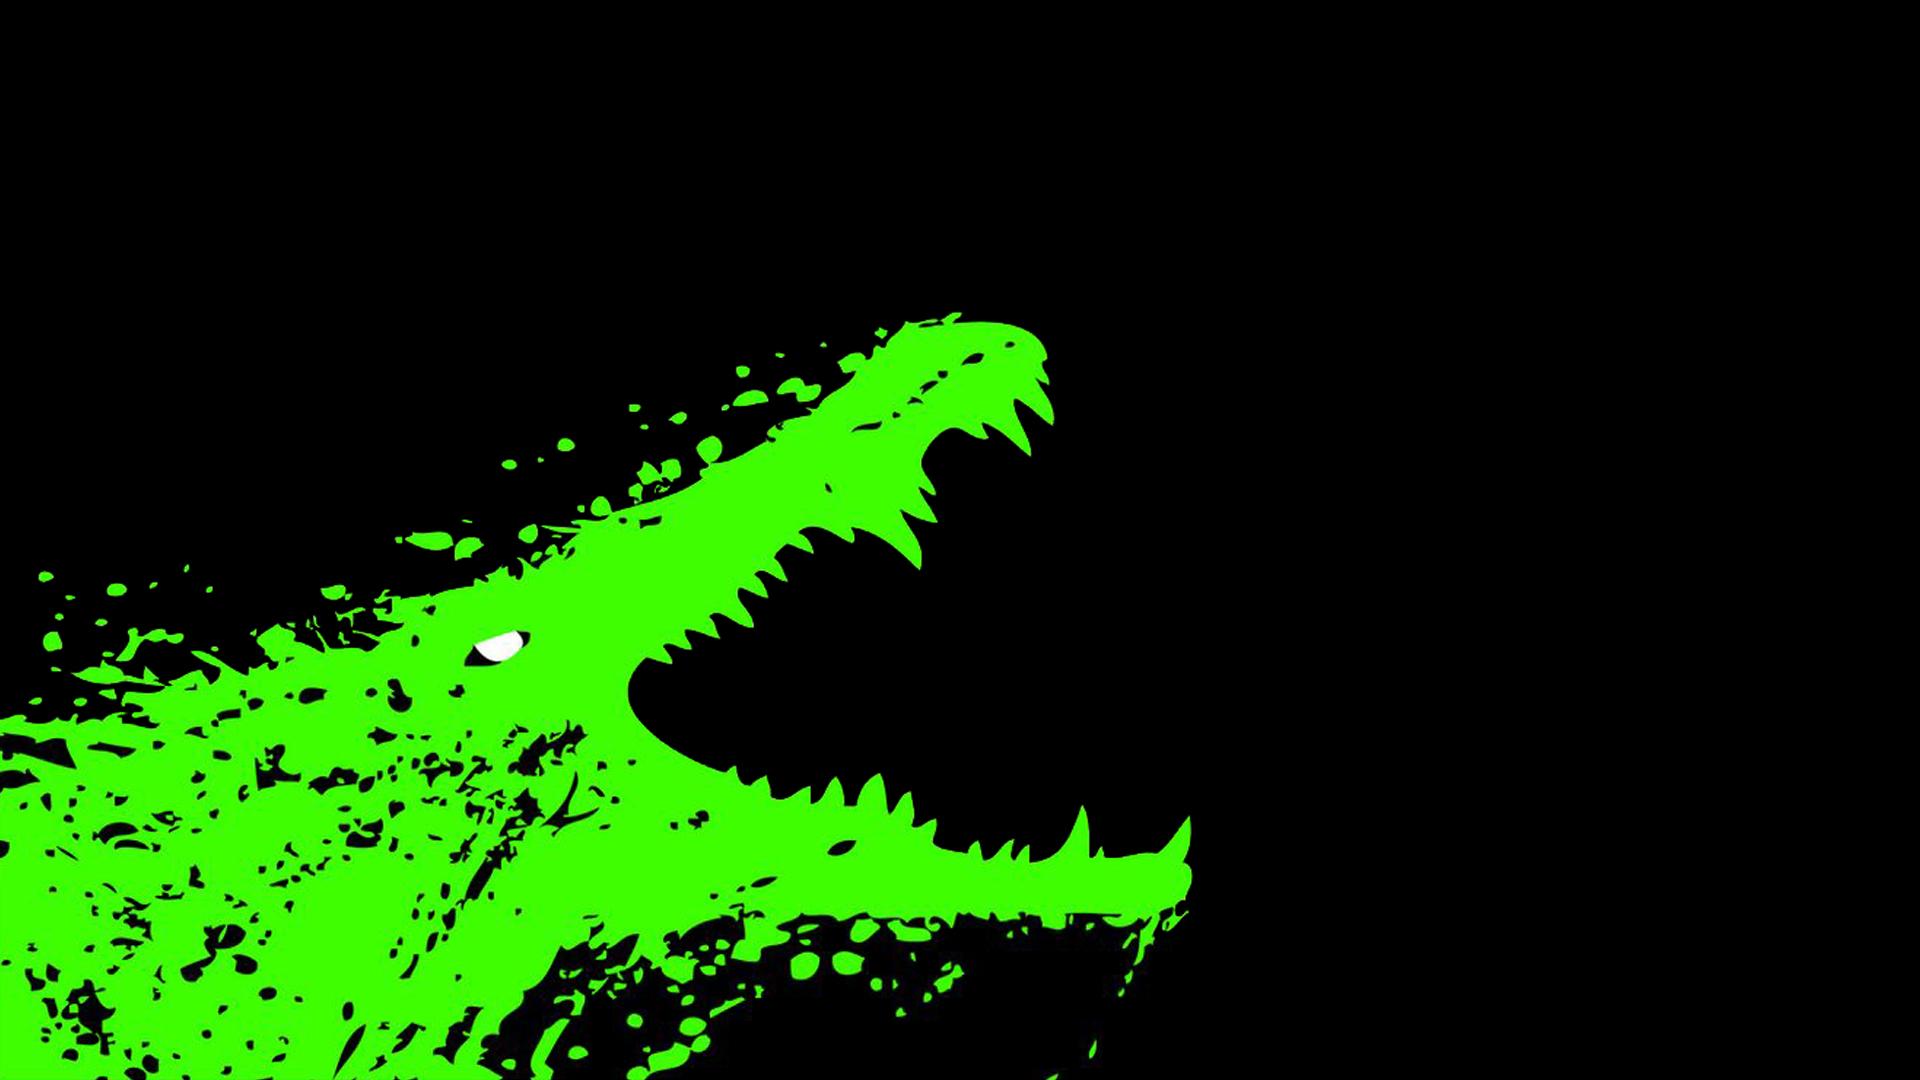 Le Crocodile de la Mort Eaten Alive Tobe Hooper Carlotta Films DVD Bluray